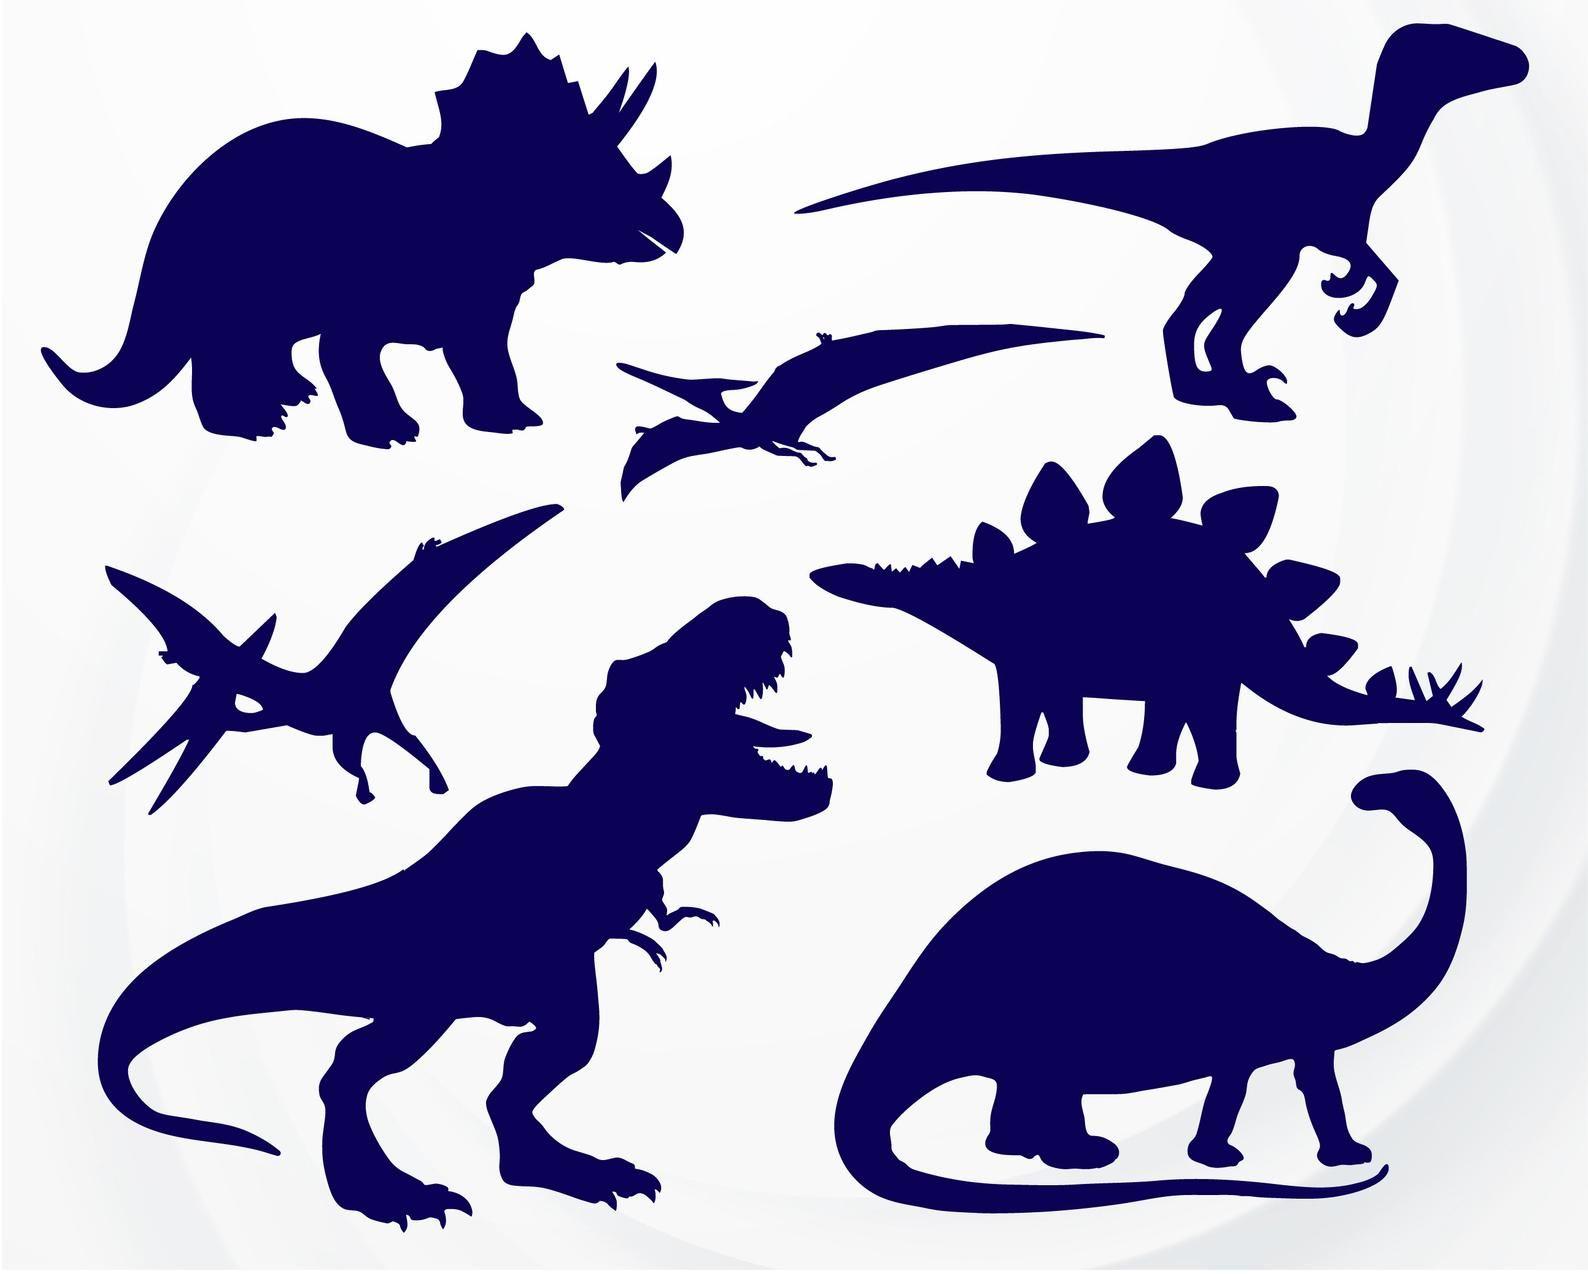 stencils svg dinosaurs png dinosaurs silhouettes dinosaur dxf dinosaurs cricut dinosaurs clipart Dinosaurs svg svg shirts animal svg